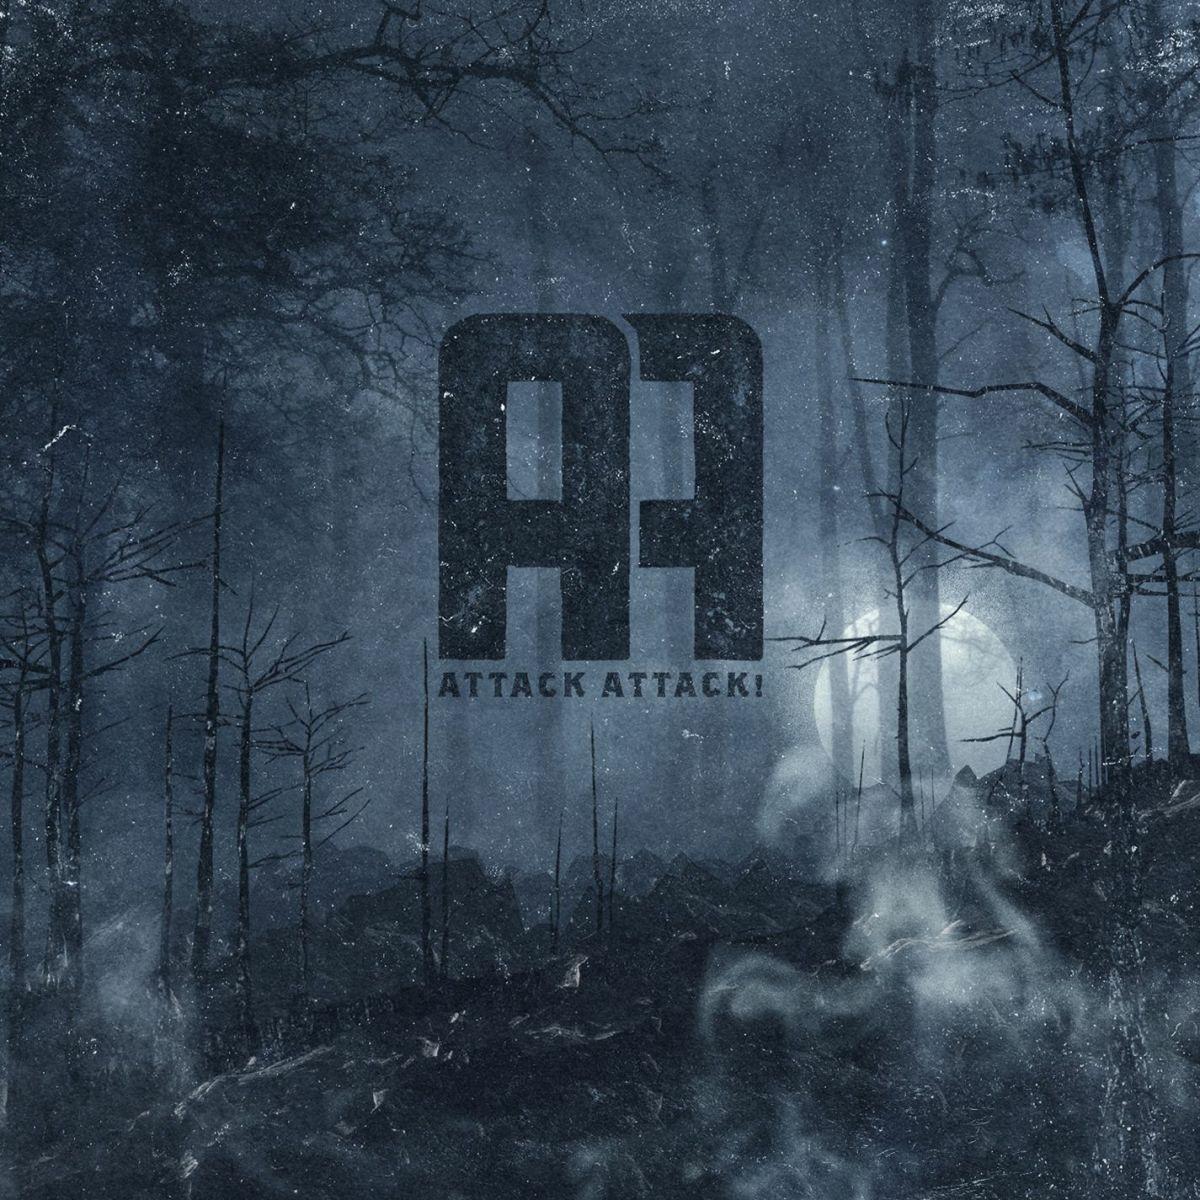 Attack Attack! - Attack Attack! [Deluxe Reissue] (2011)